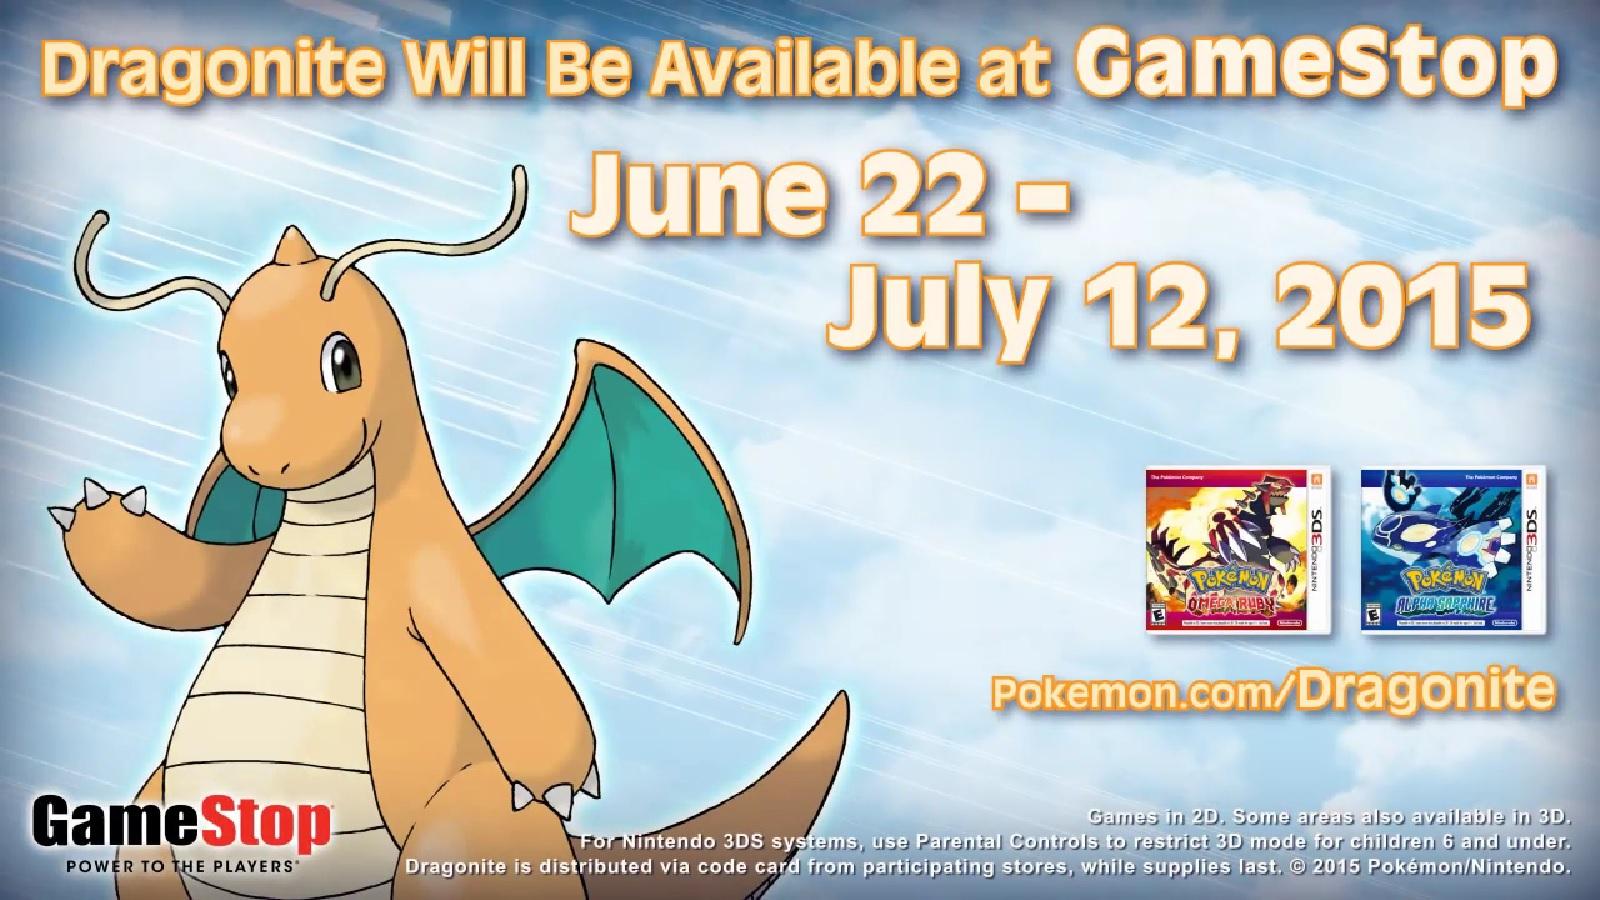 Gamestop Kicking Off Dragonite Distribution For Pokemon